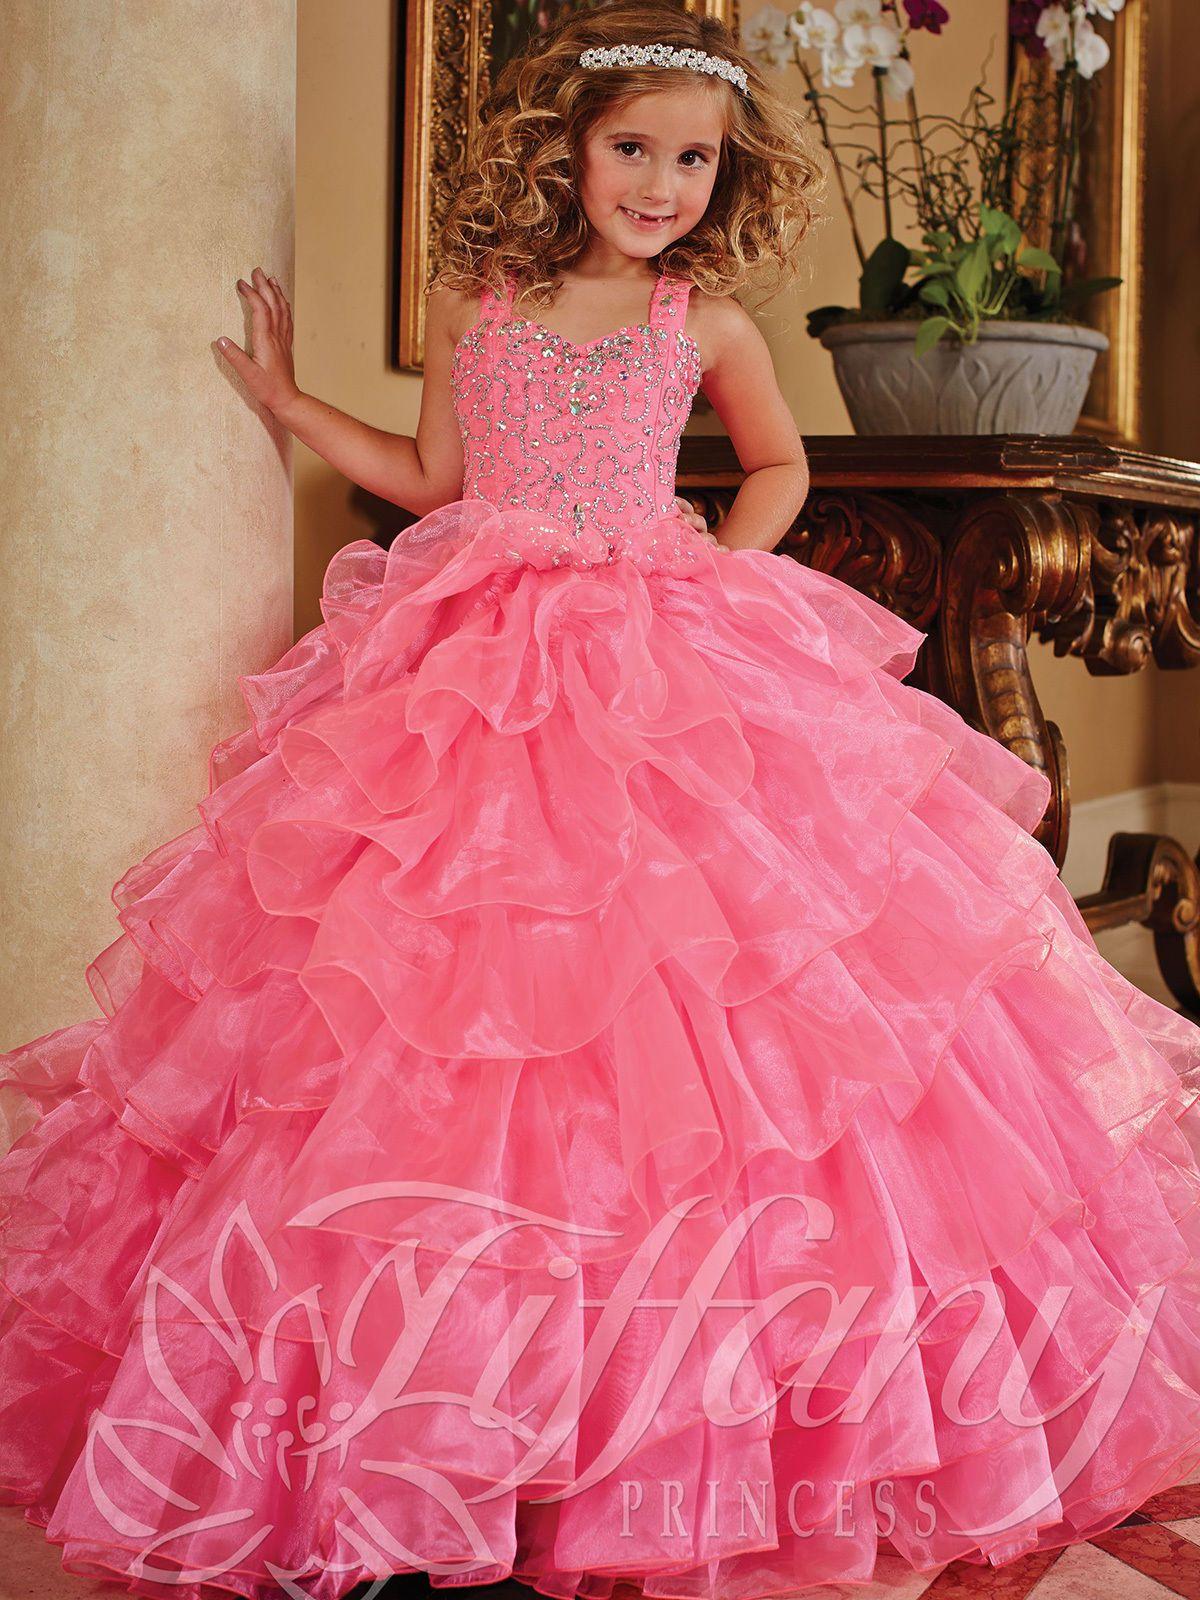 Pink Elegant Formal Pageant Flower Girls Dress Wedding Princess